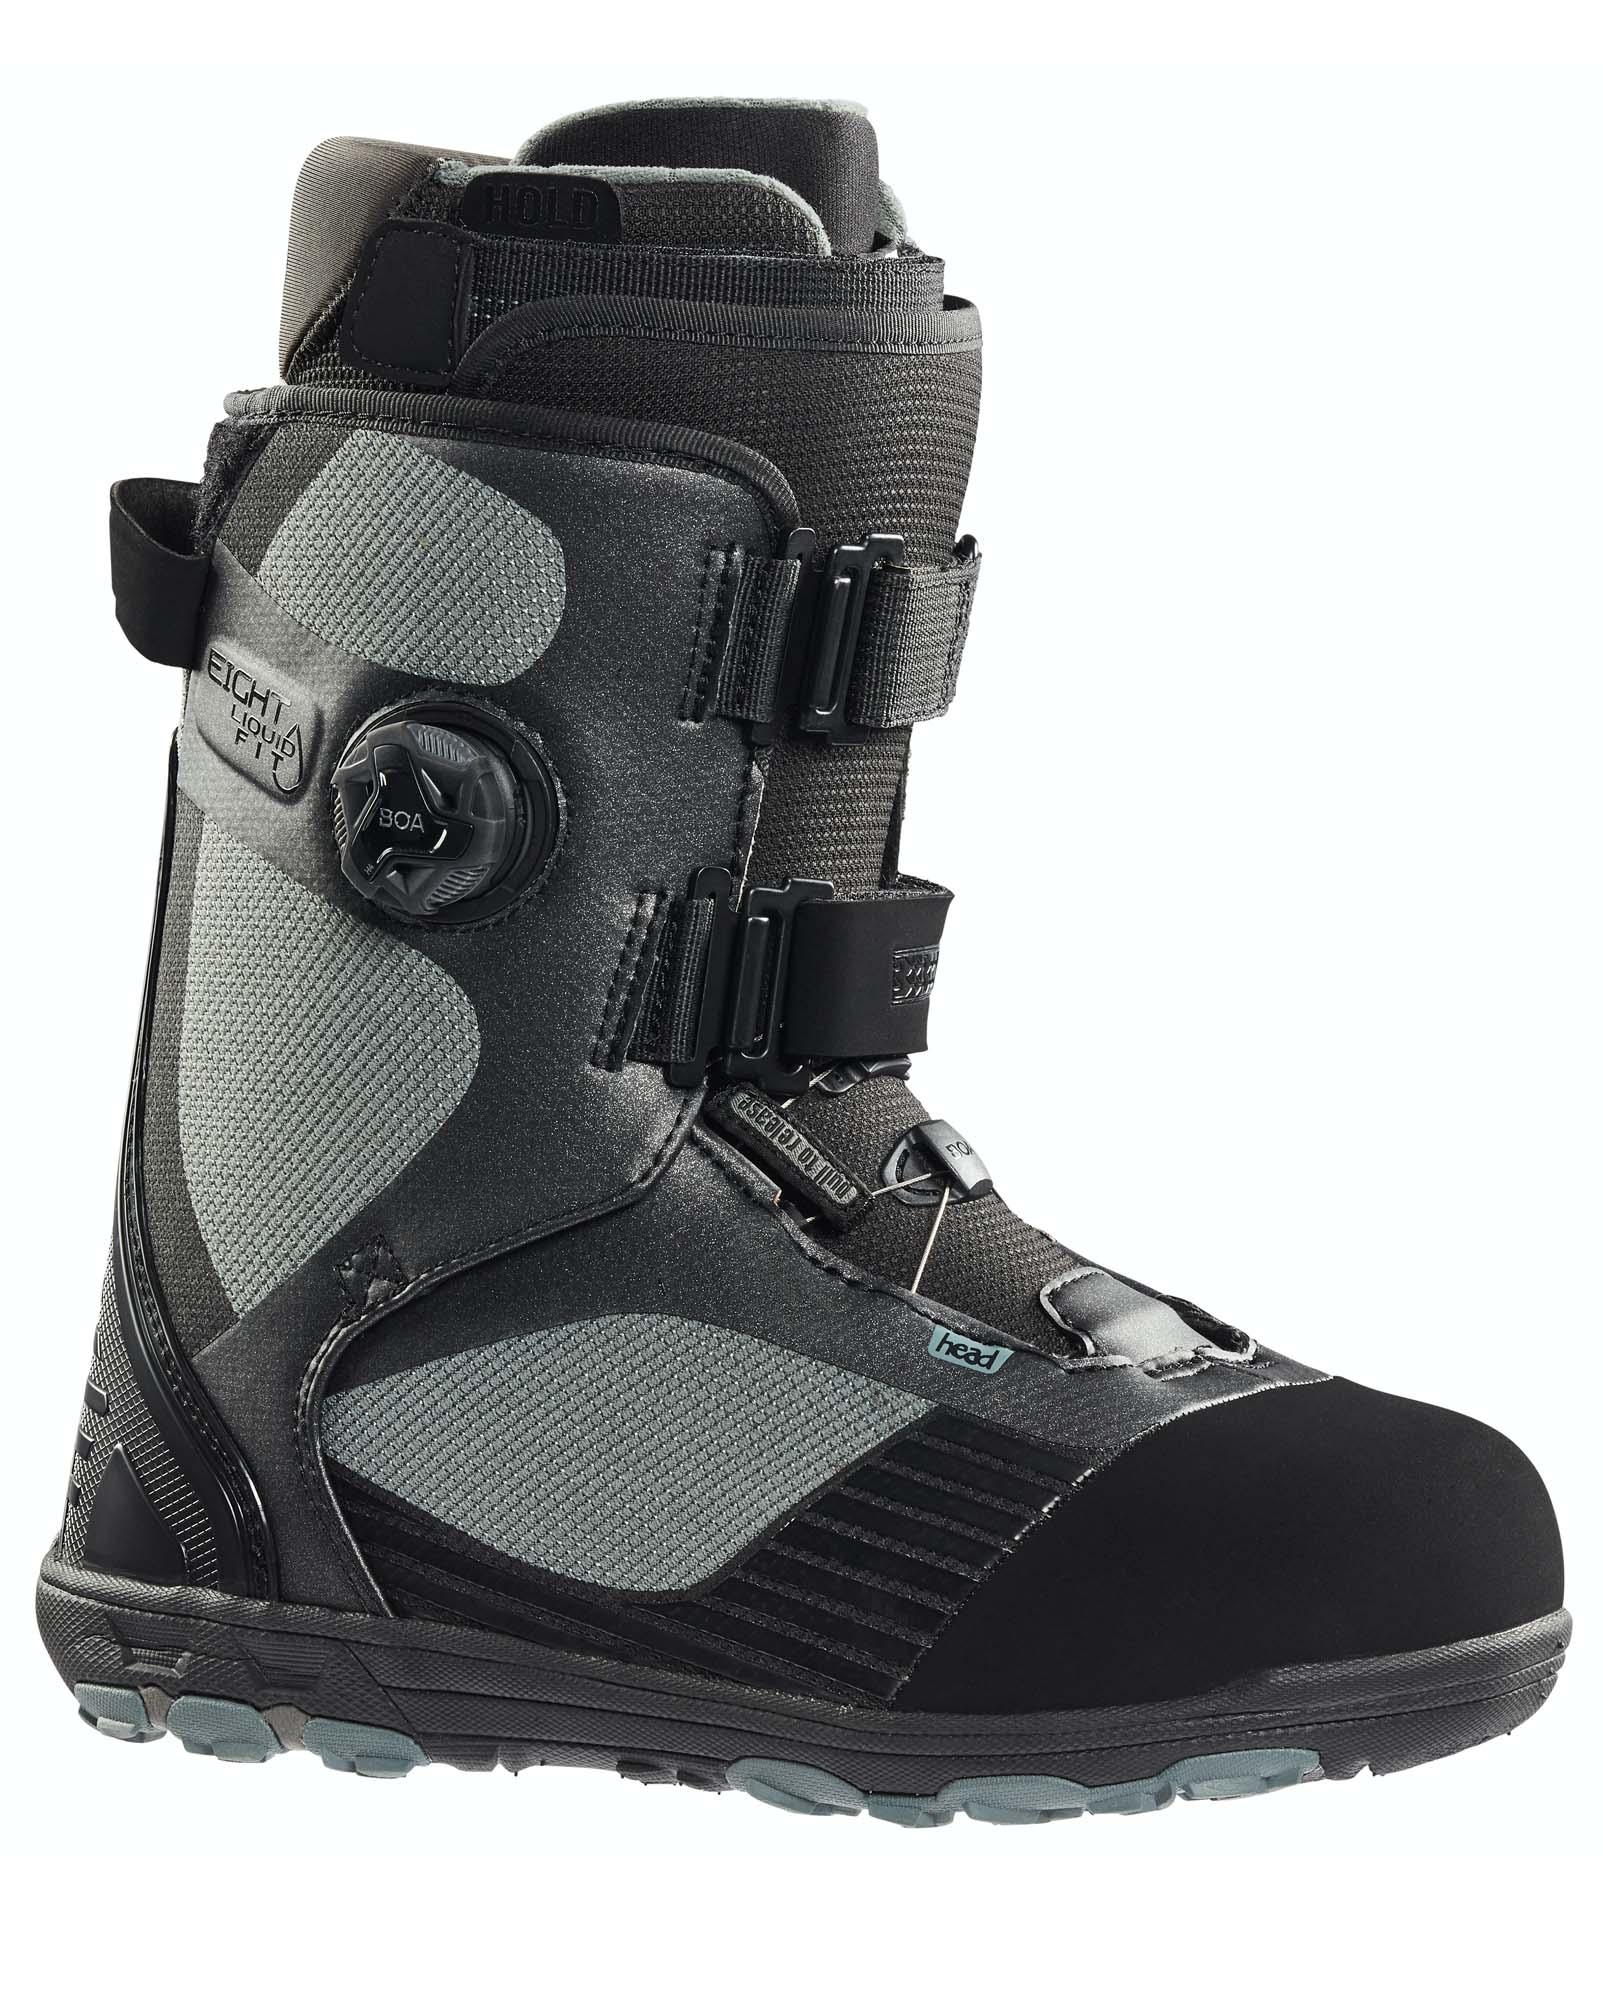 Head 21/22 Snowboard Boots